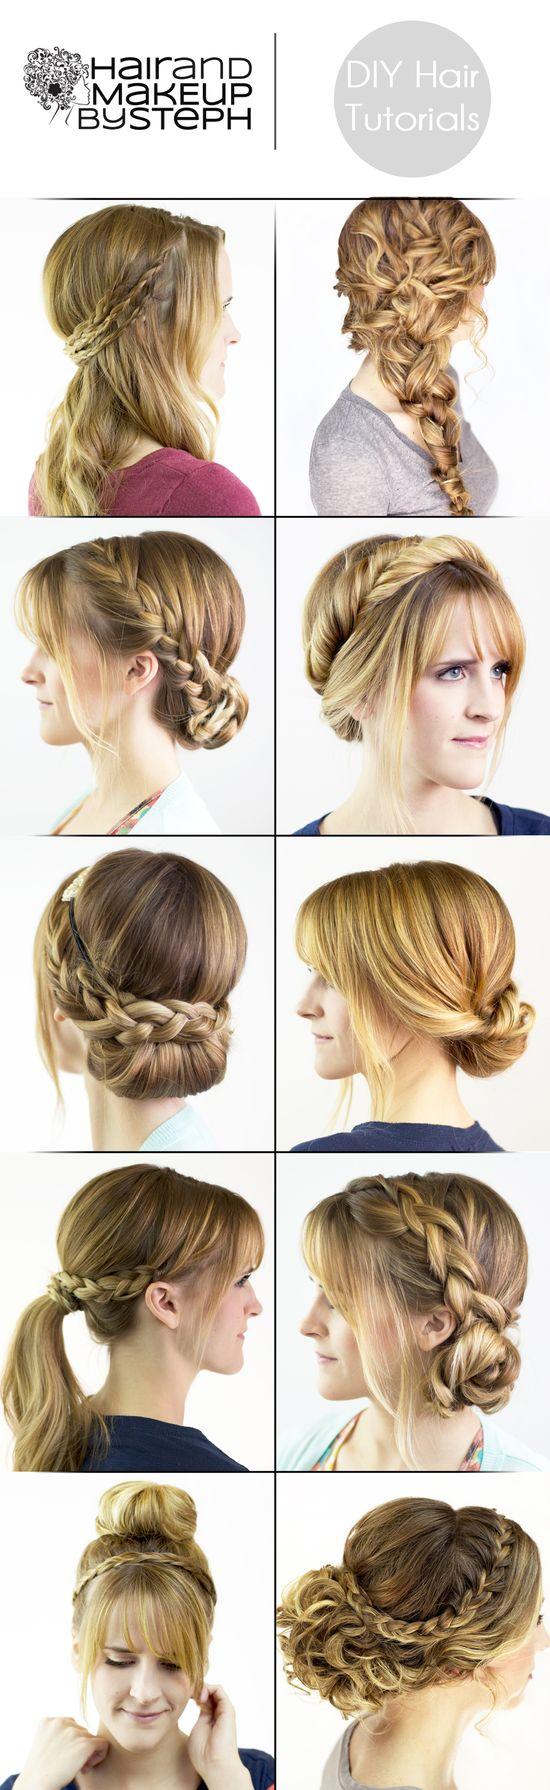 23 DIY hair styles..  #hair #diy